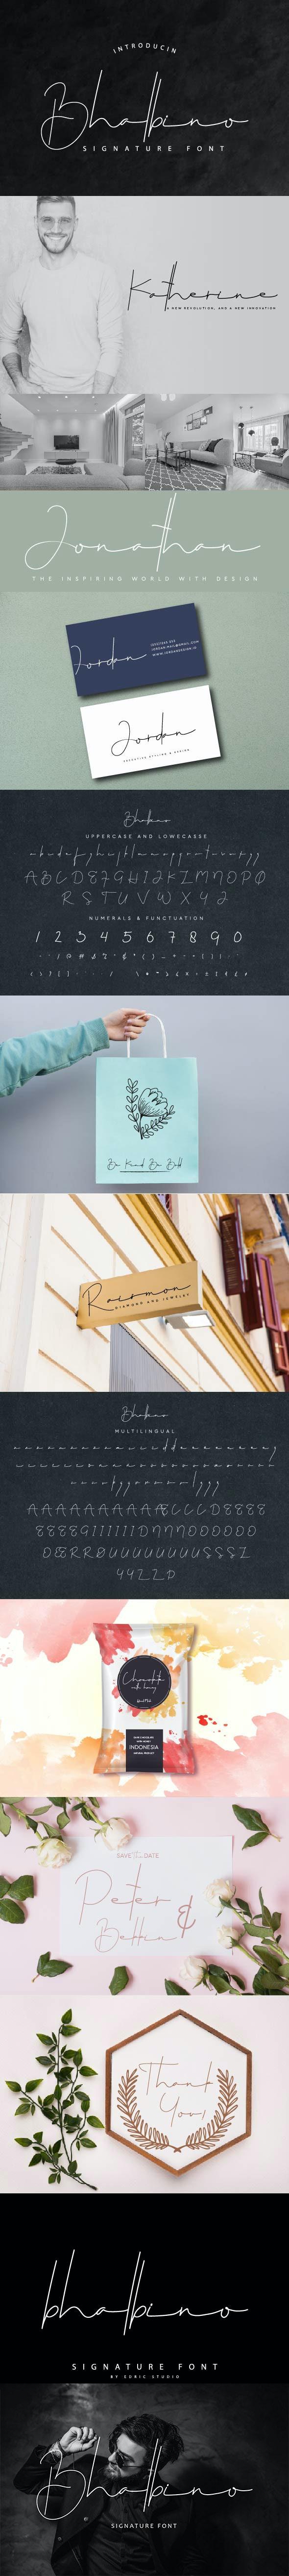 Bhalbino Signature Font - Handwriting Fonts